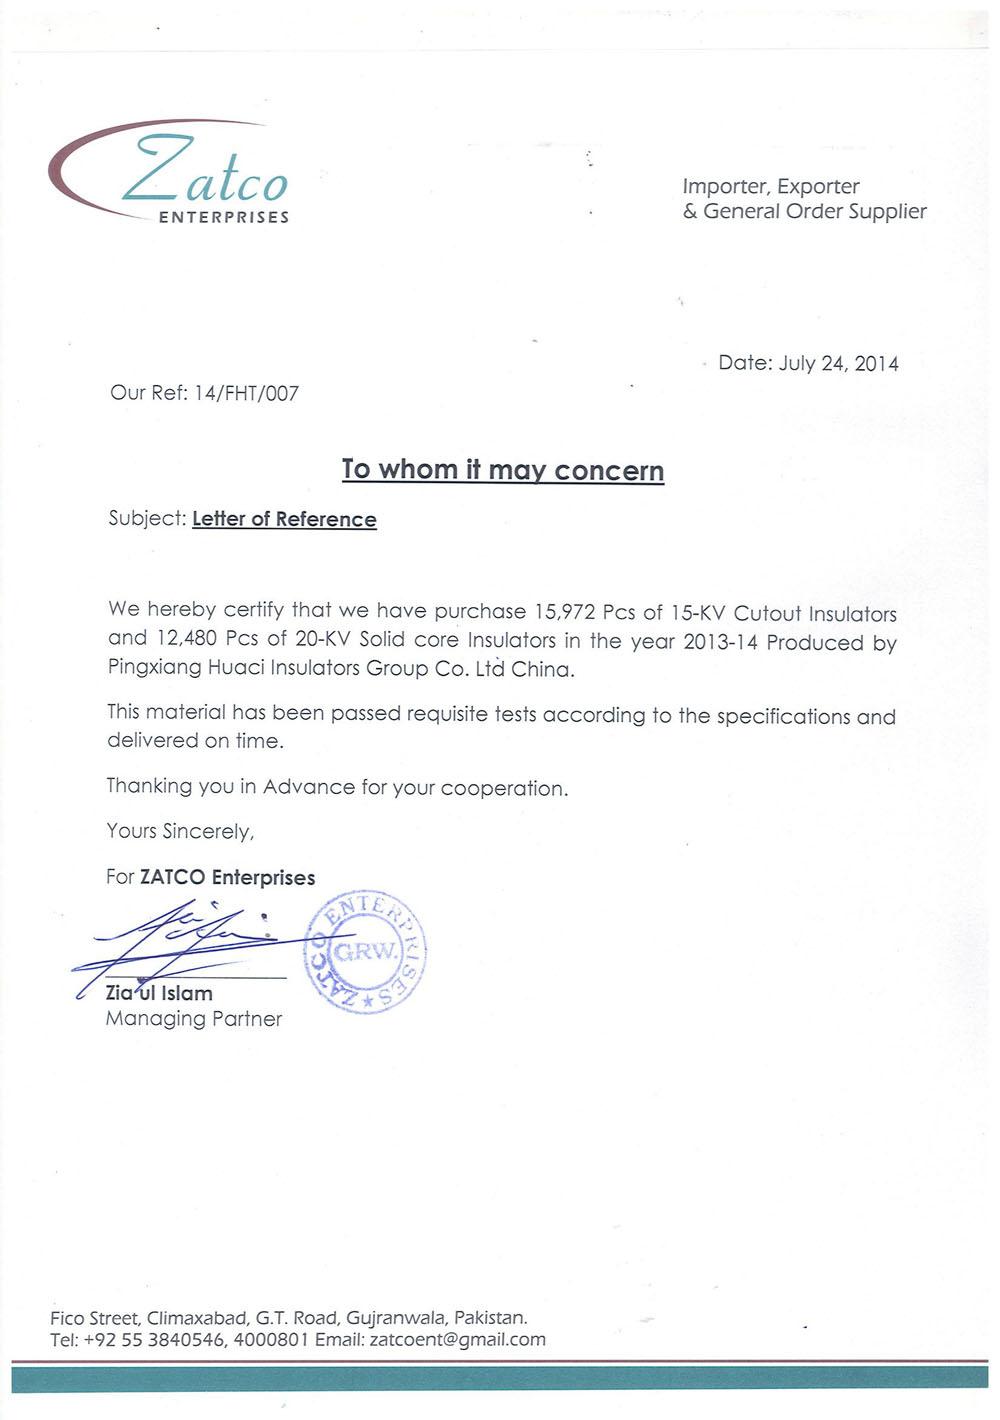 Pakistan ZATCO Enterprises